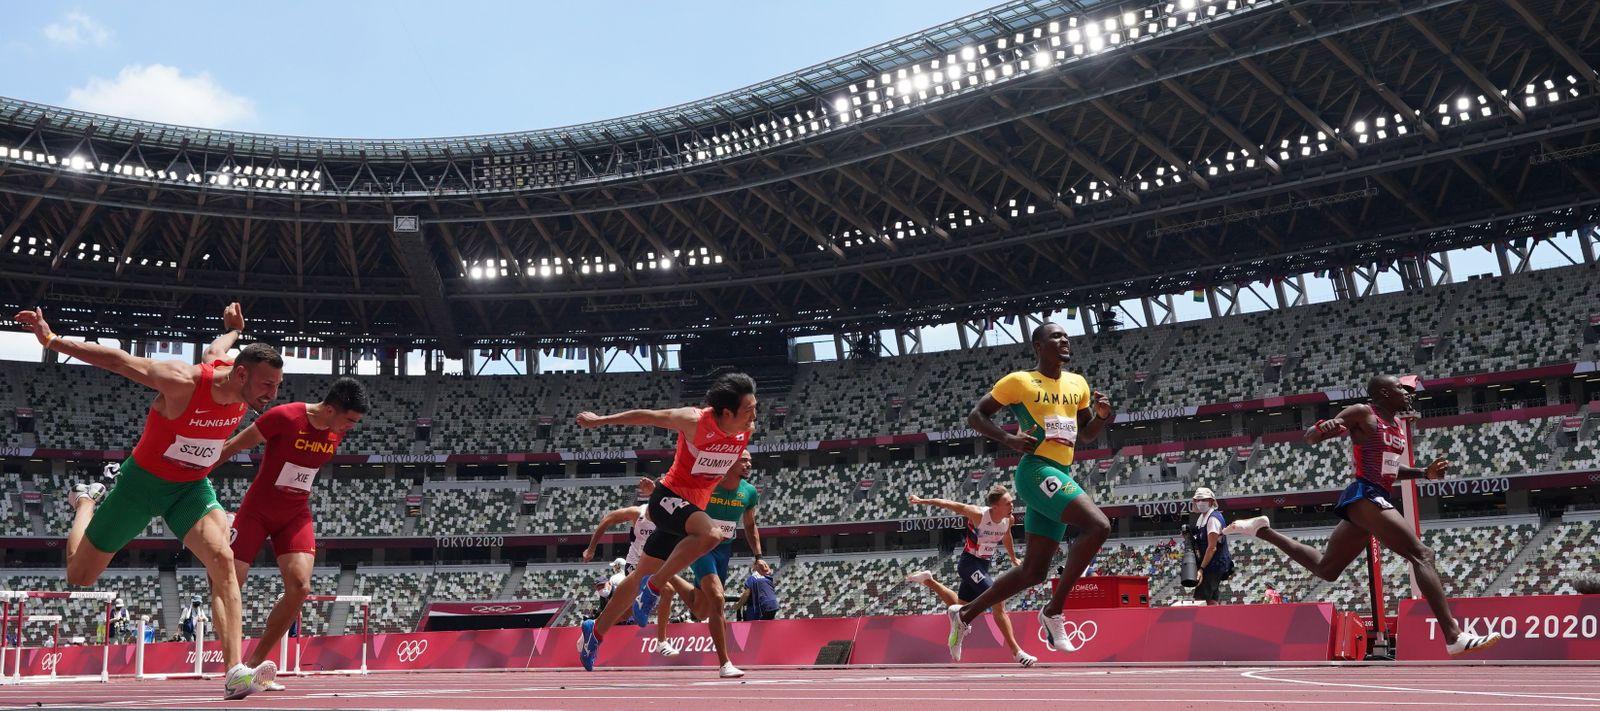 Athletics - Men's 110m Hurdles - Semifinal